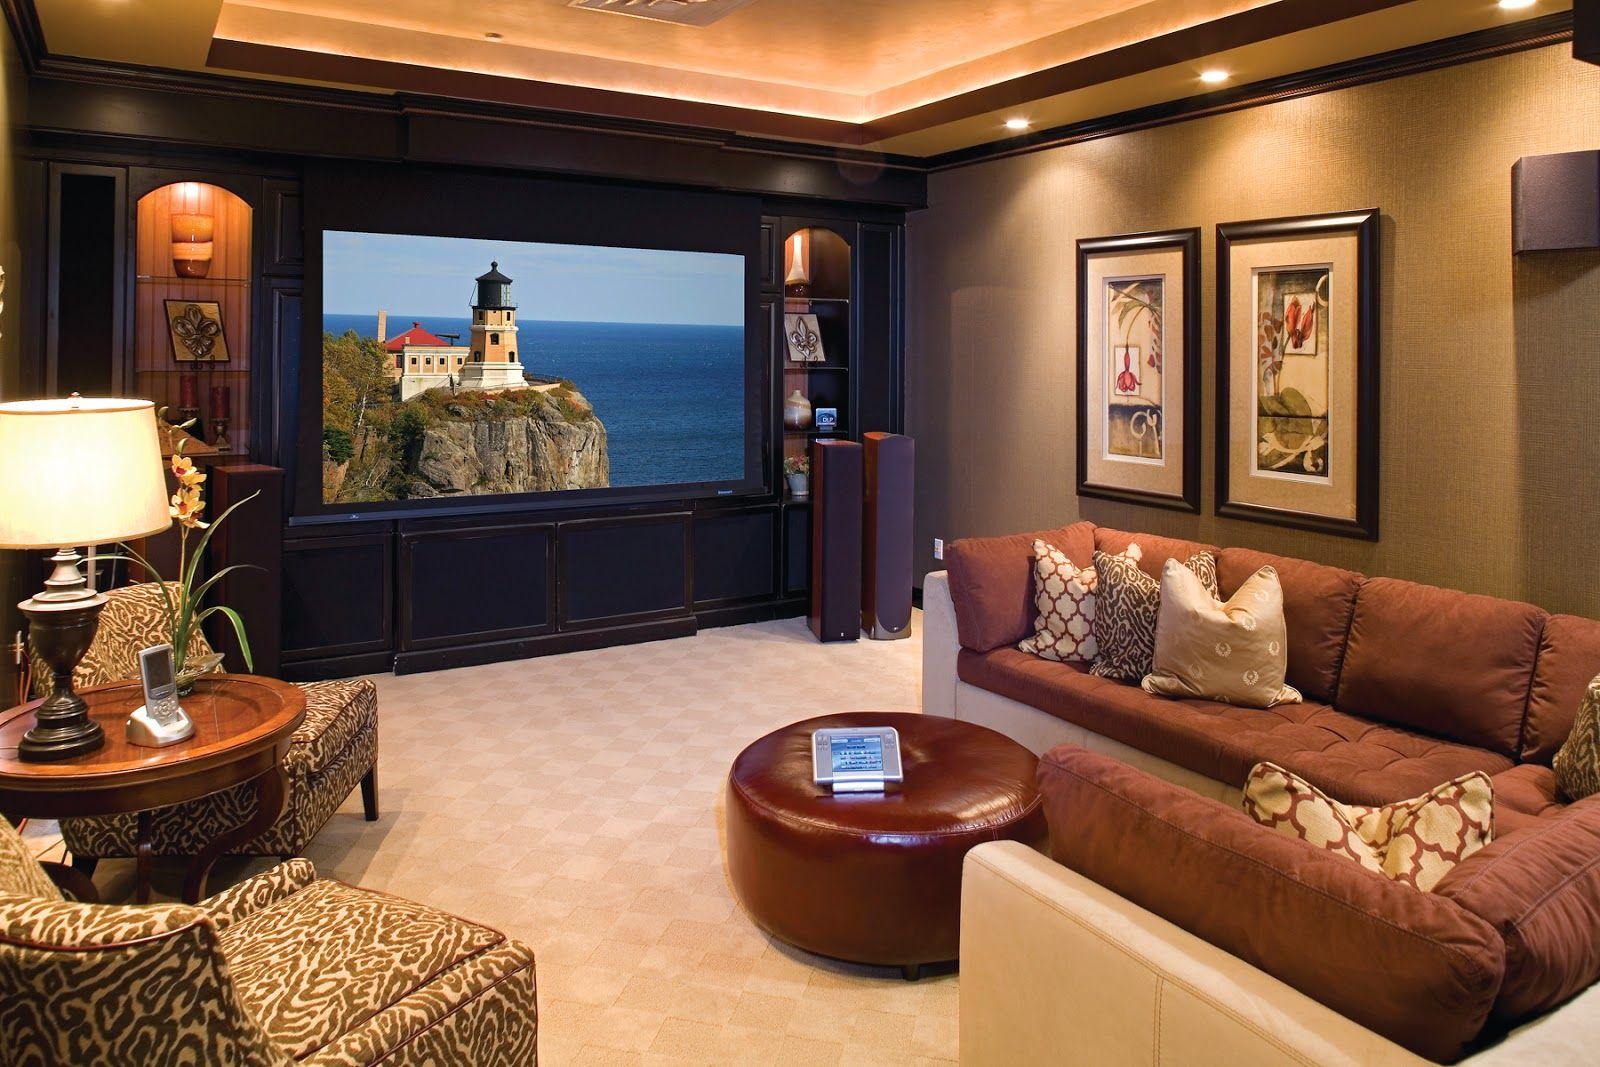 hight resolution of cozy basement living room entertainment center basement remodeling kitchen remodeling remodeling ideas